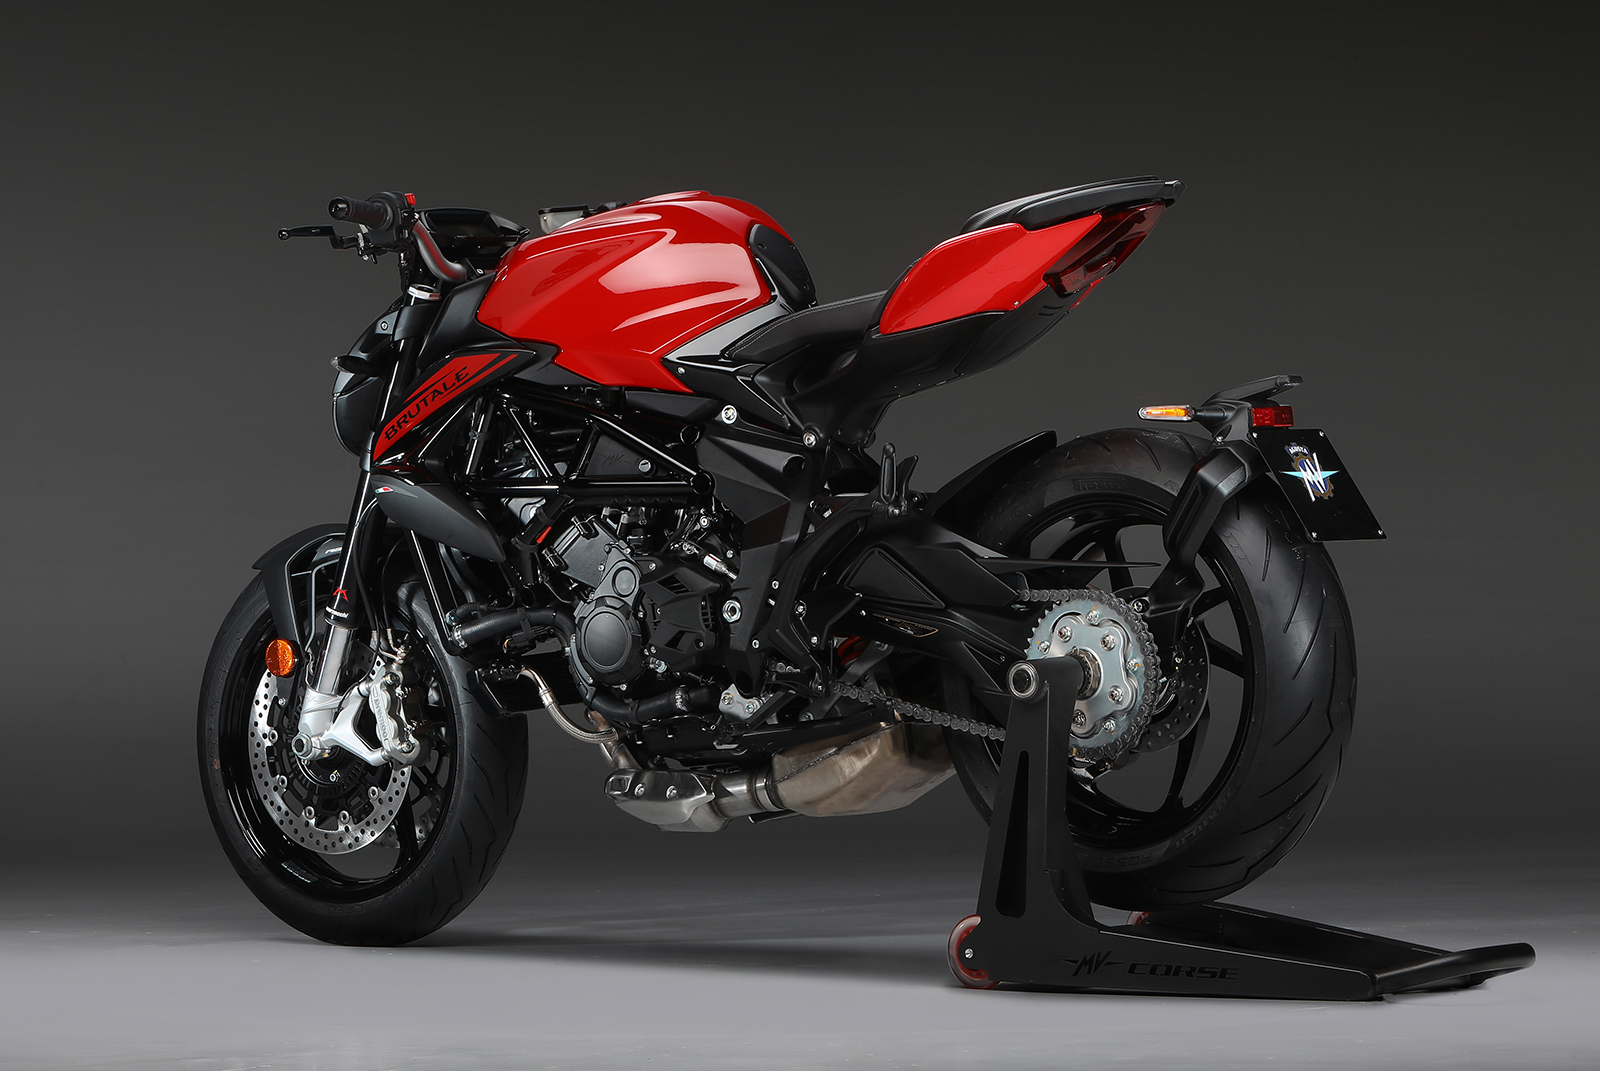 Ago Red / Metallic Carbon Black